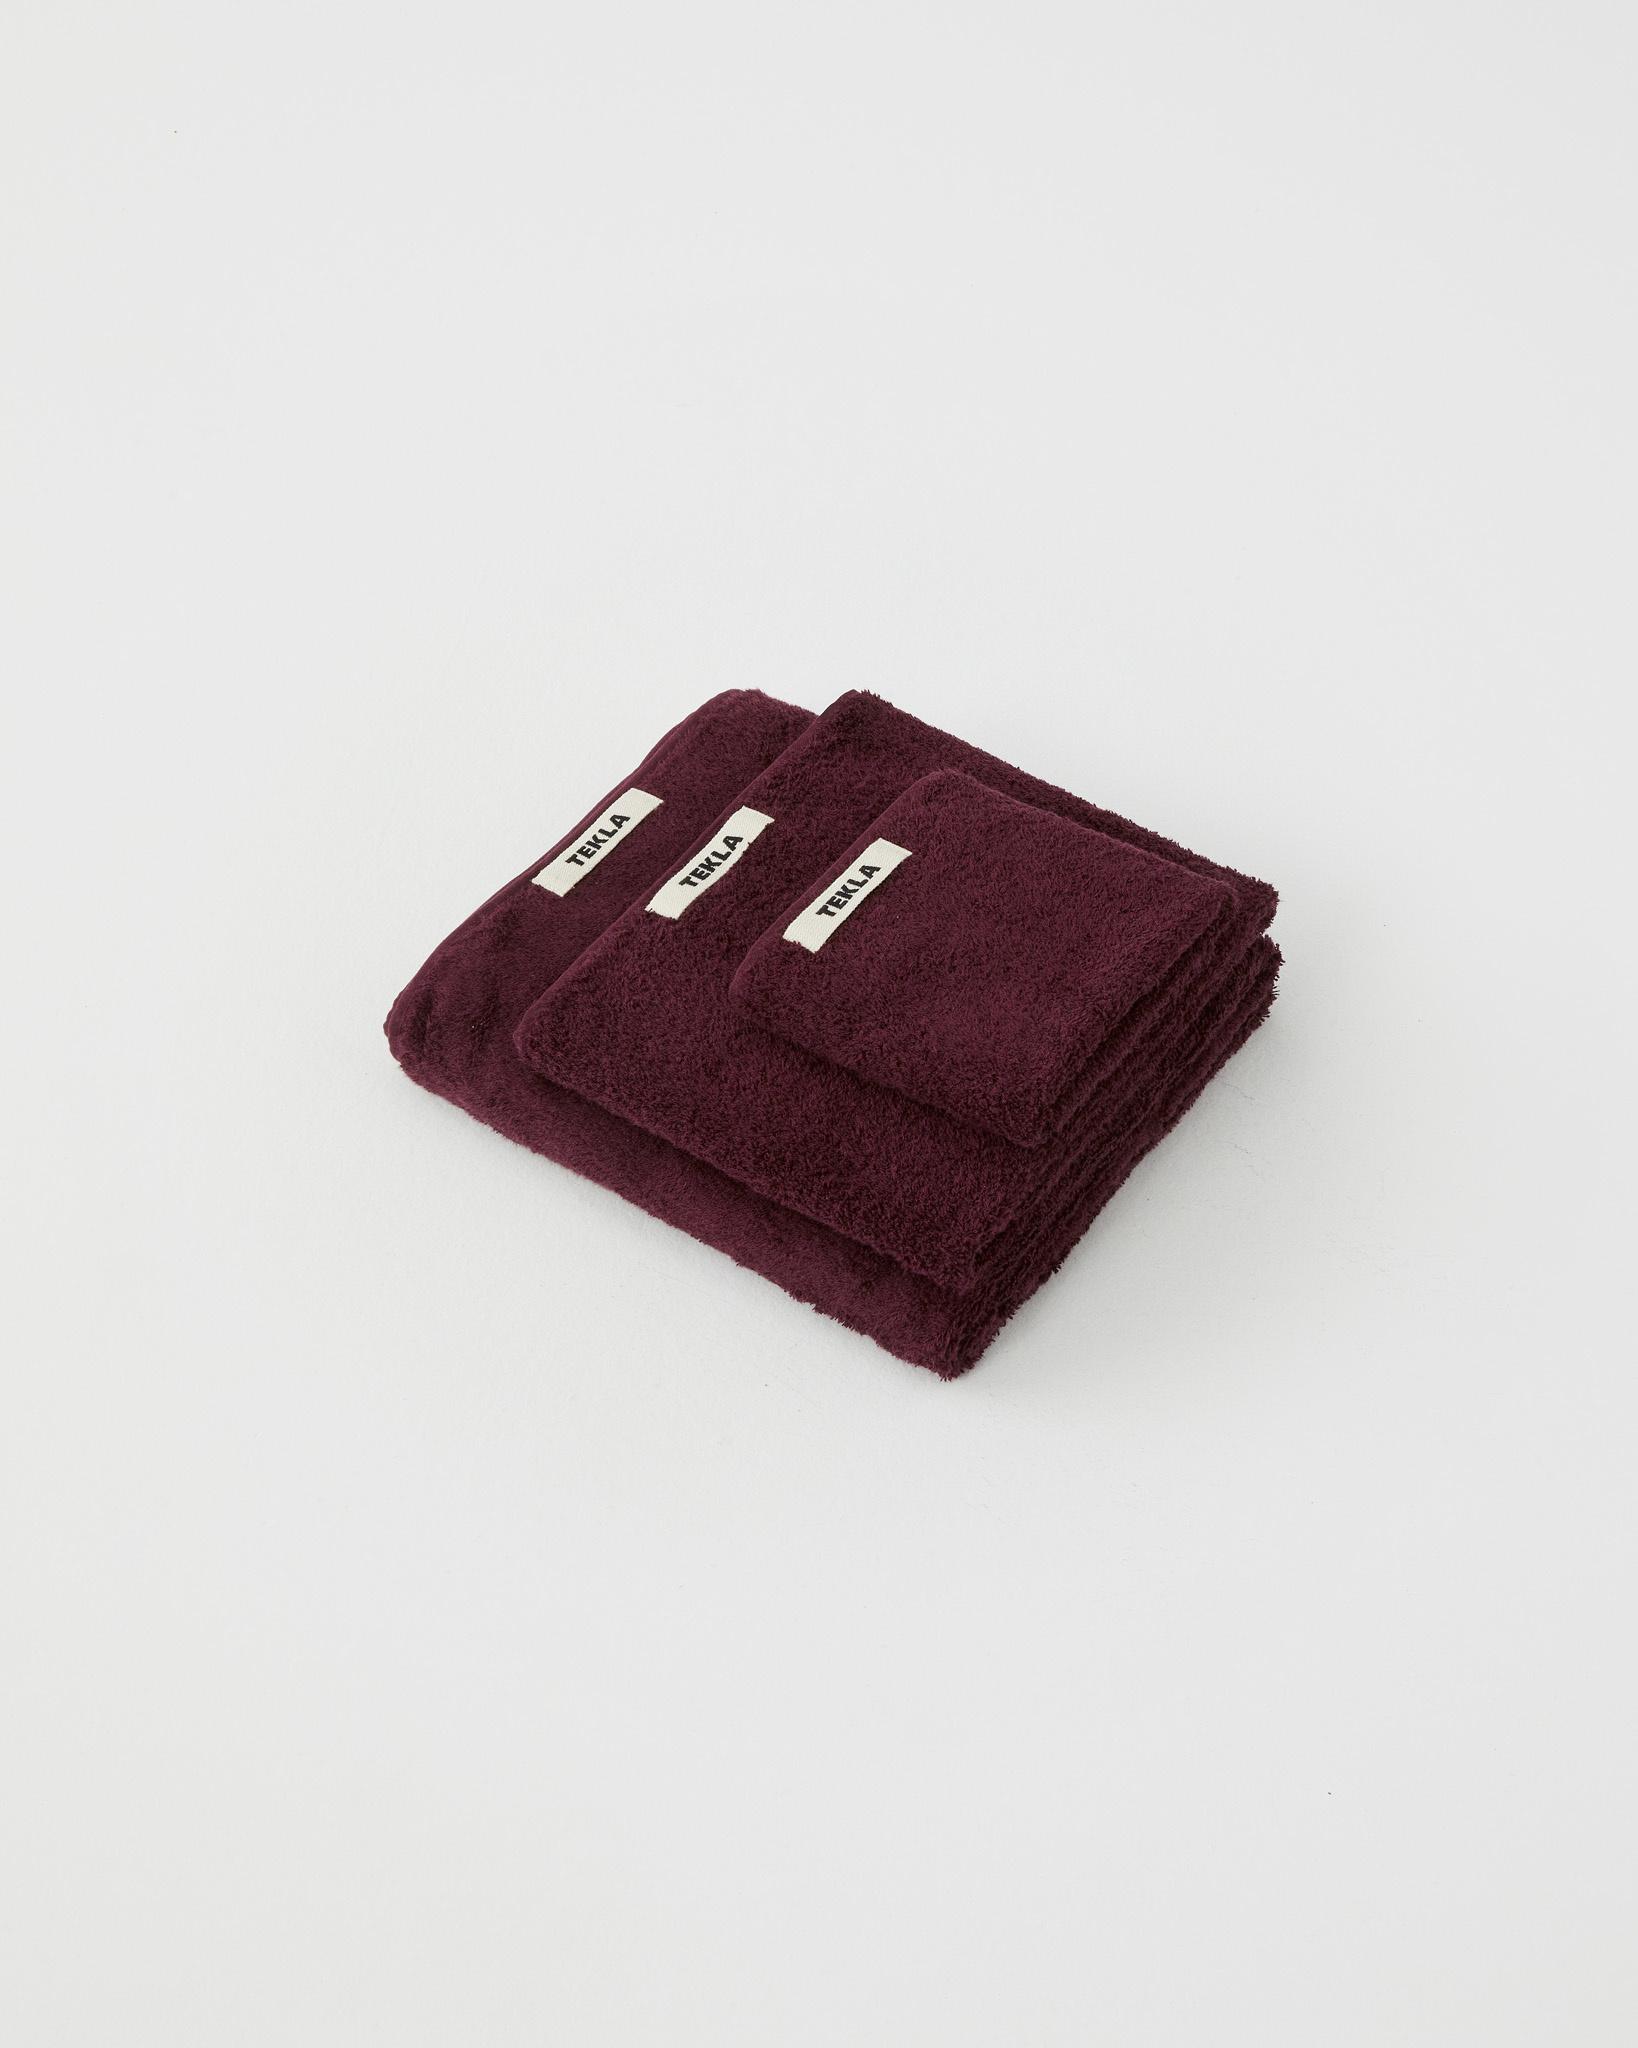 TEKLA Organic Bath Towel in Plum Red